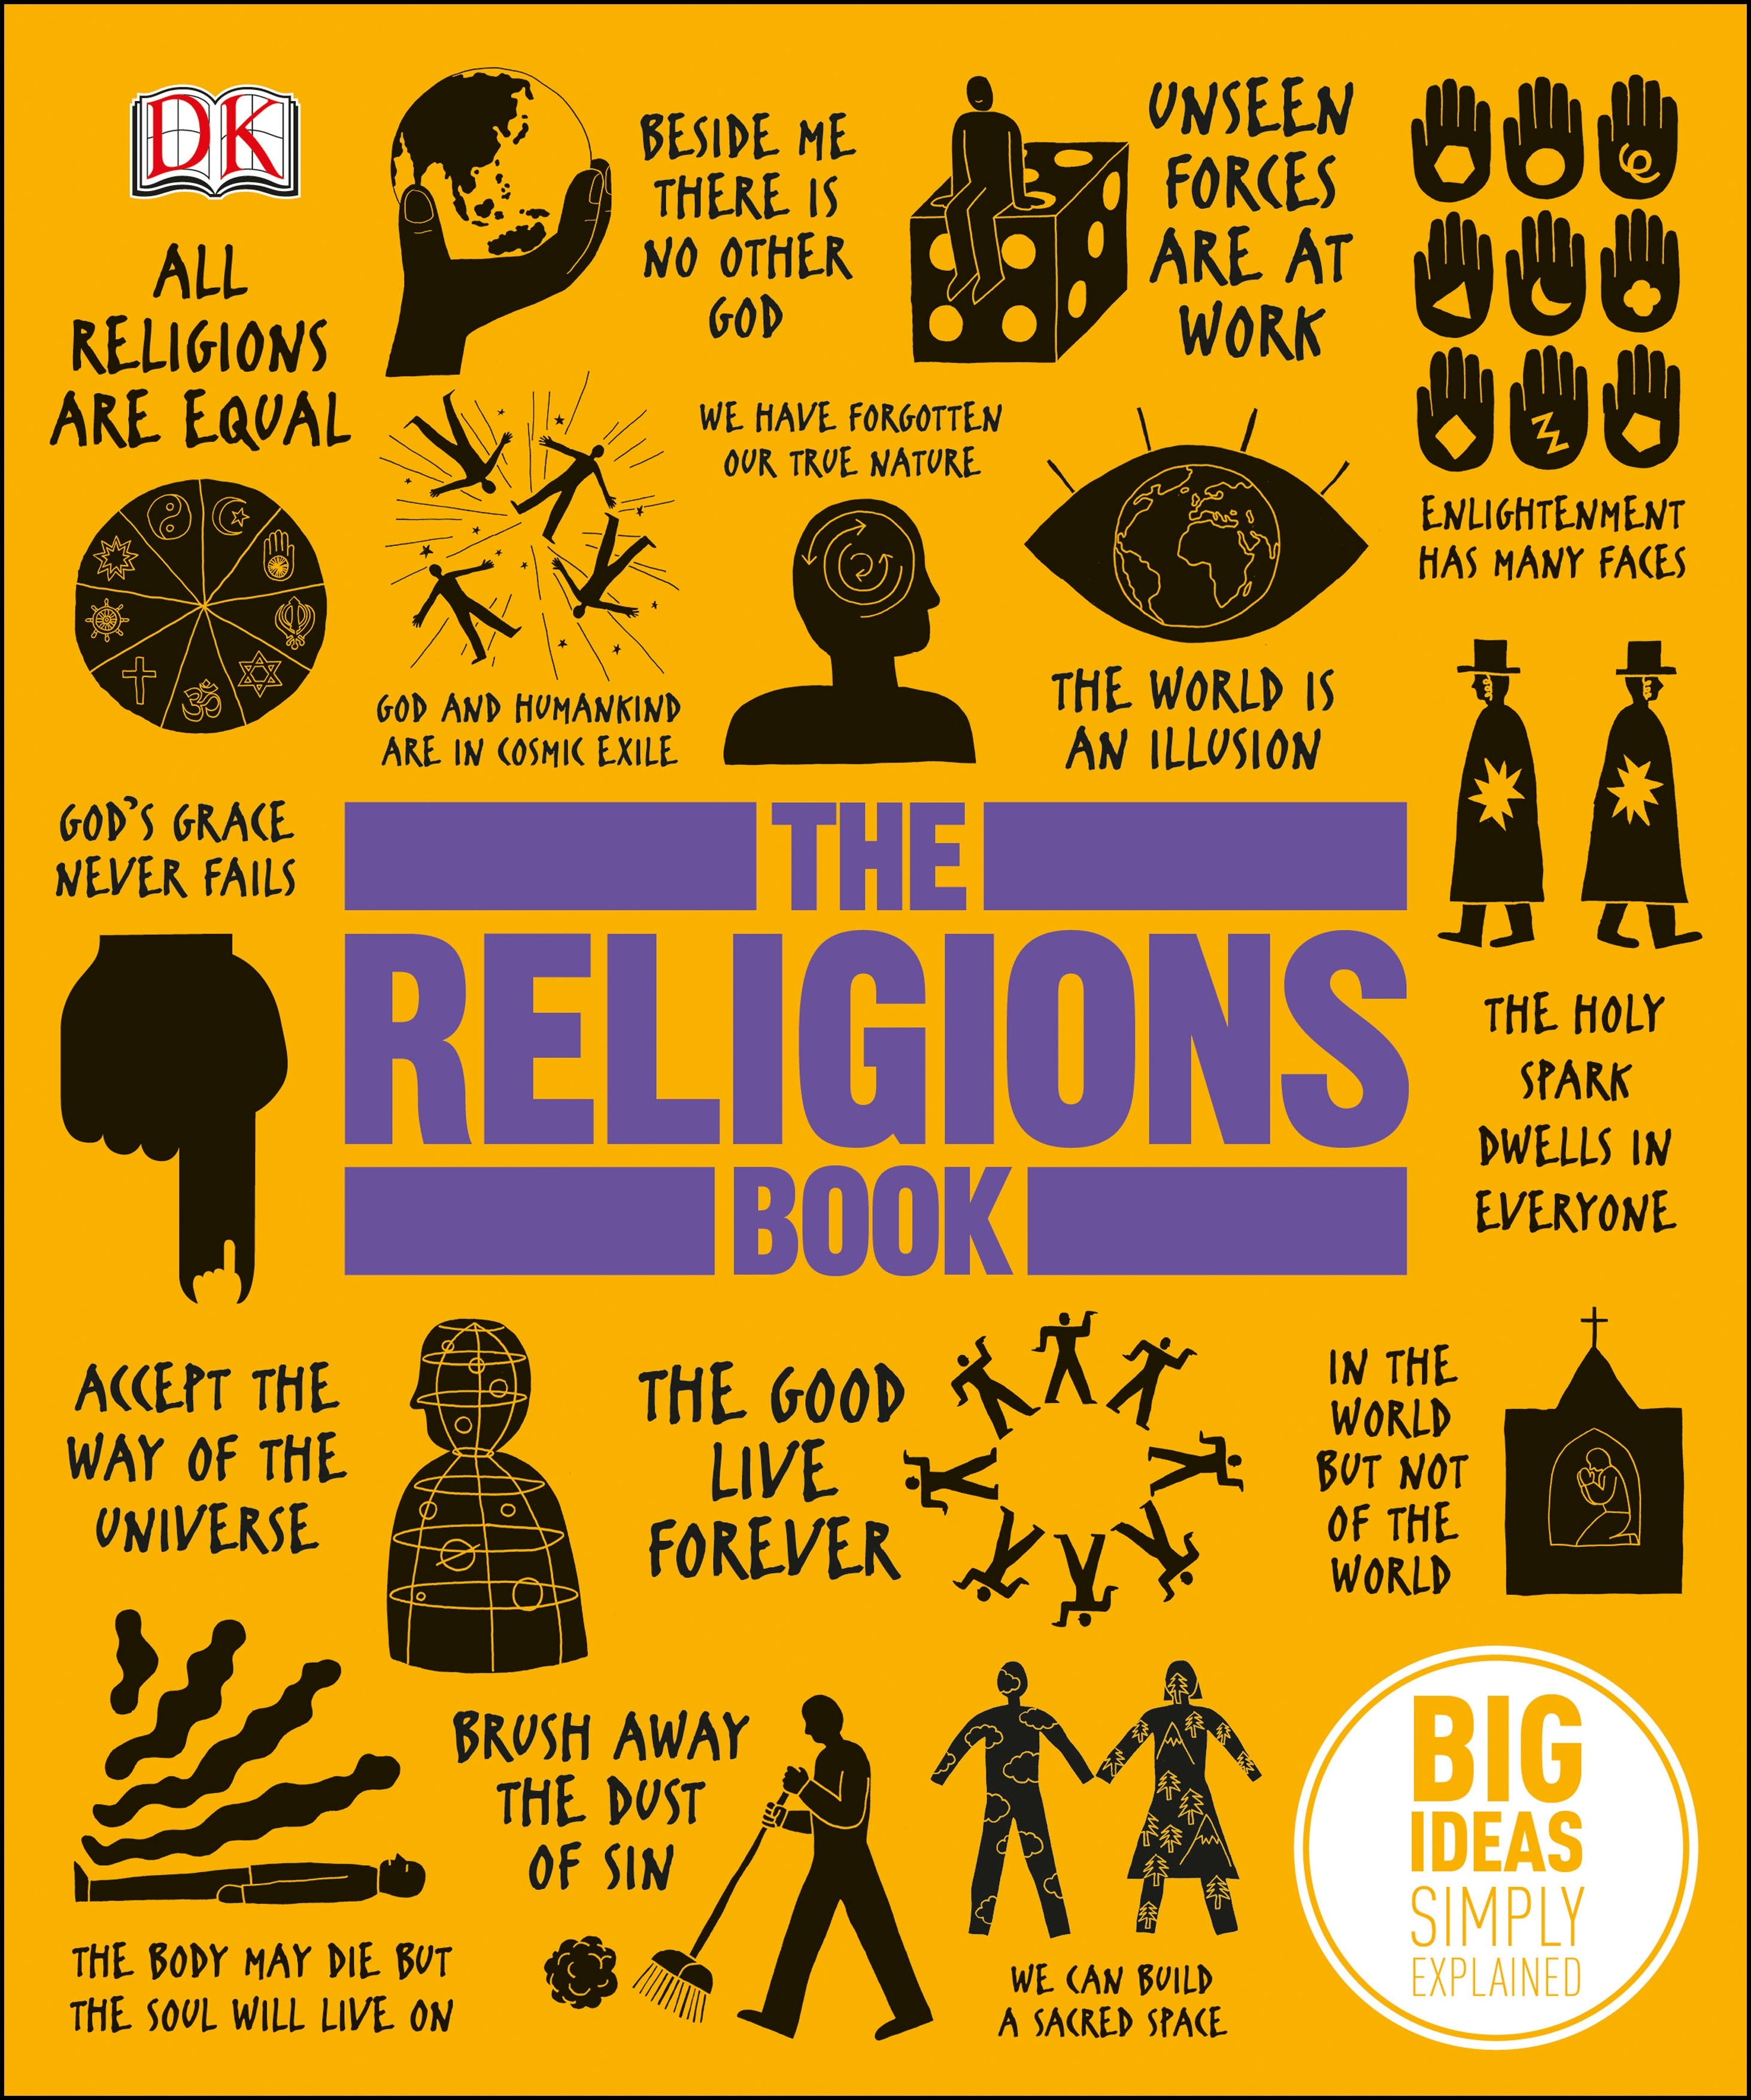 The Religions Book By DK Penguin Books Australia - World religions explained